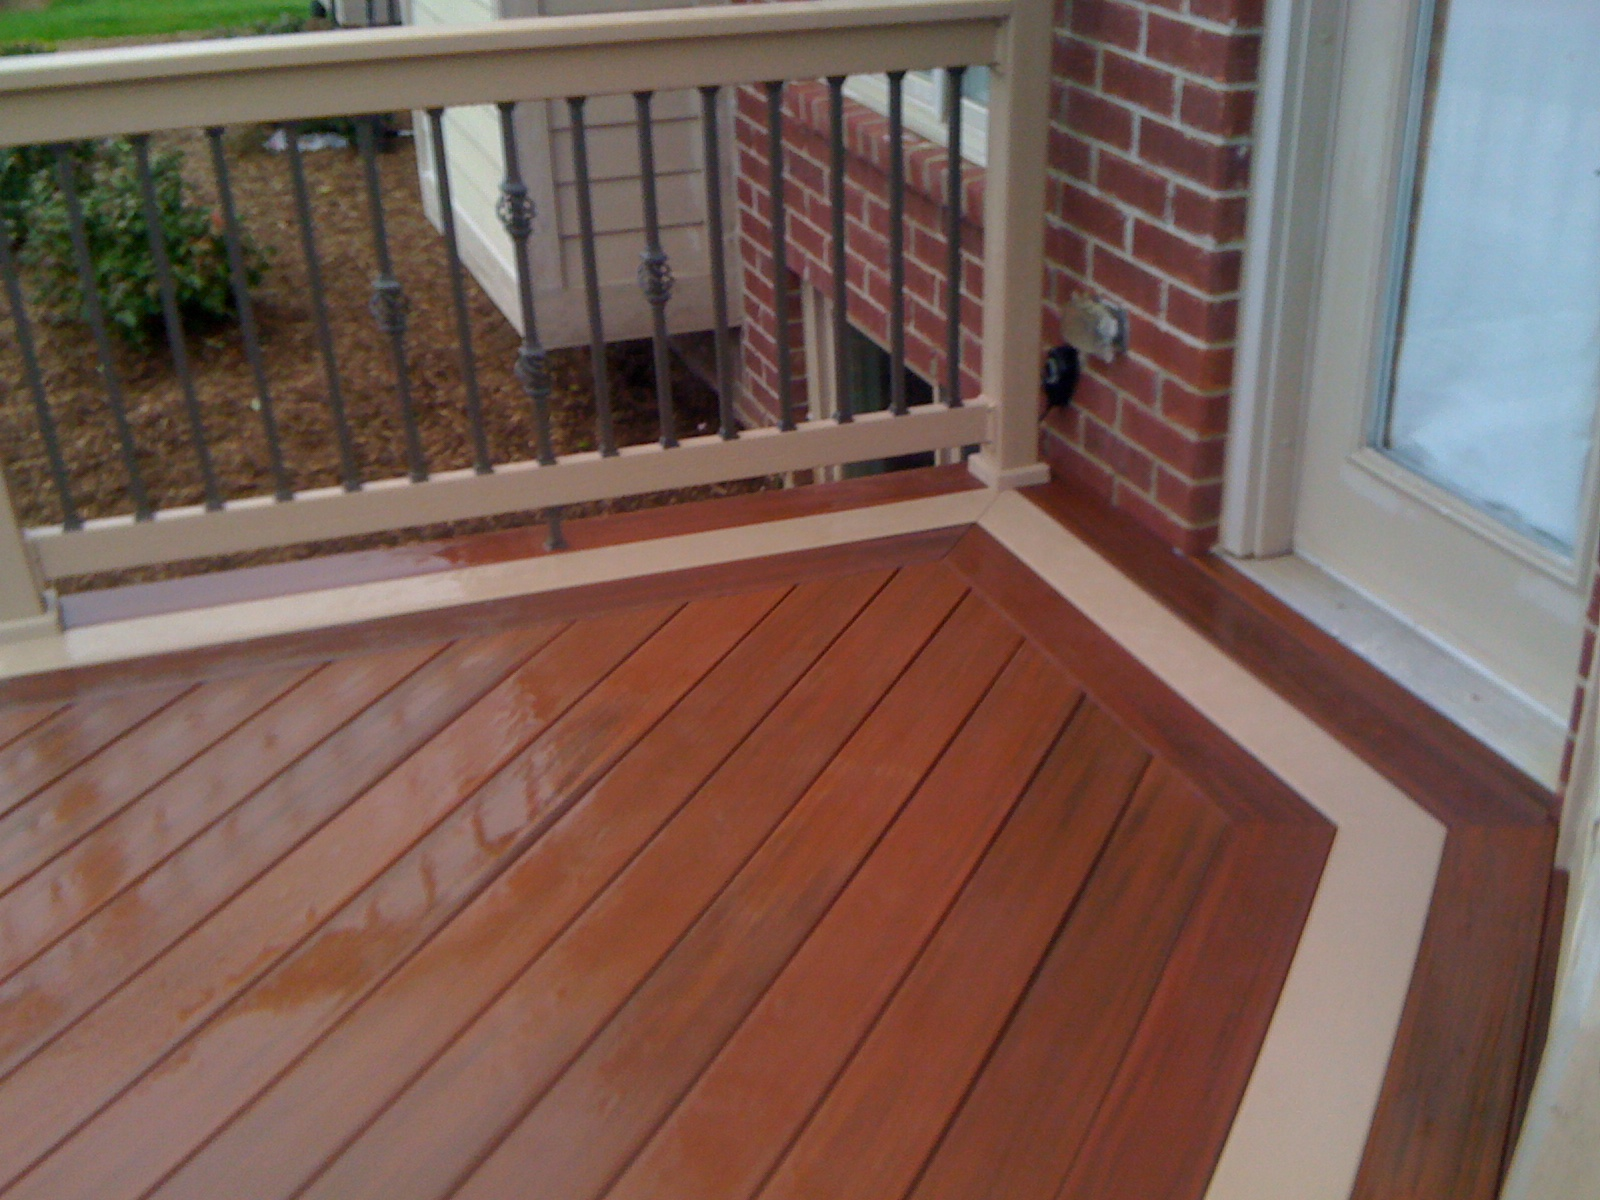 Deck designs autumnwoodconstructions blog form equals function for deck designing baanklon Choice Image